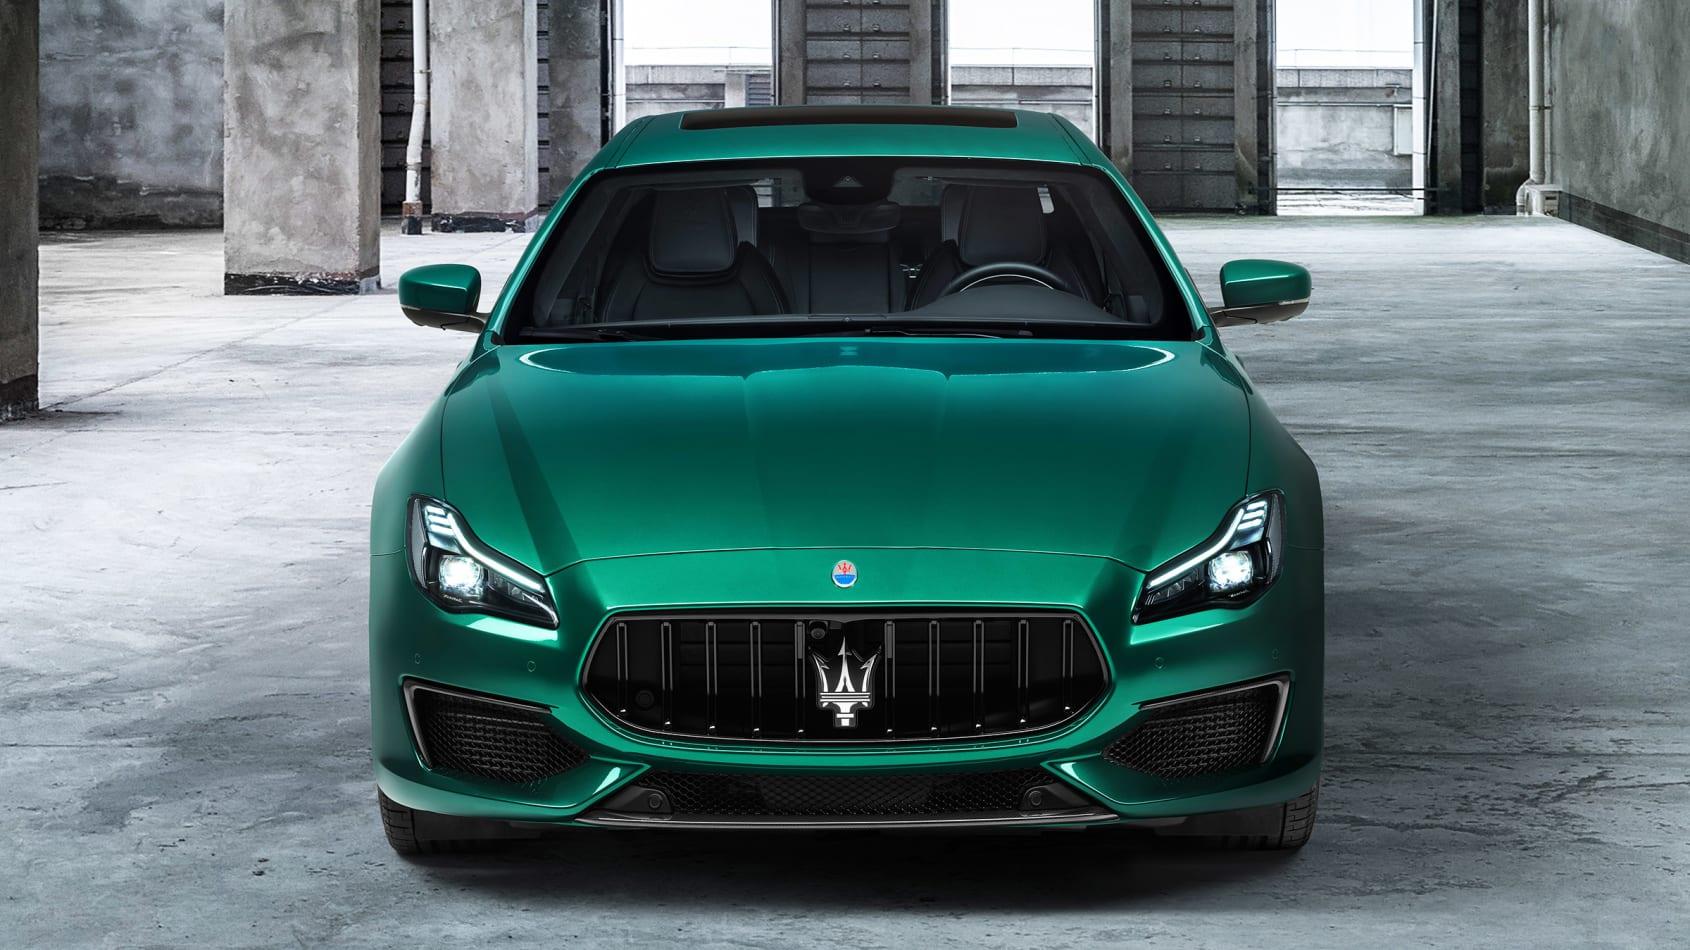 [Image: Maserati%20Quattroporte%20Trofeo.jpg]